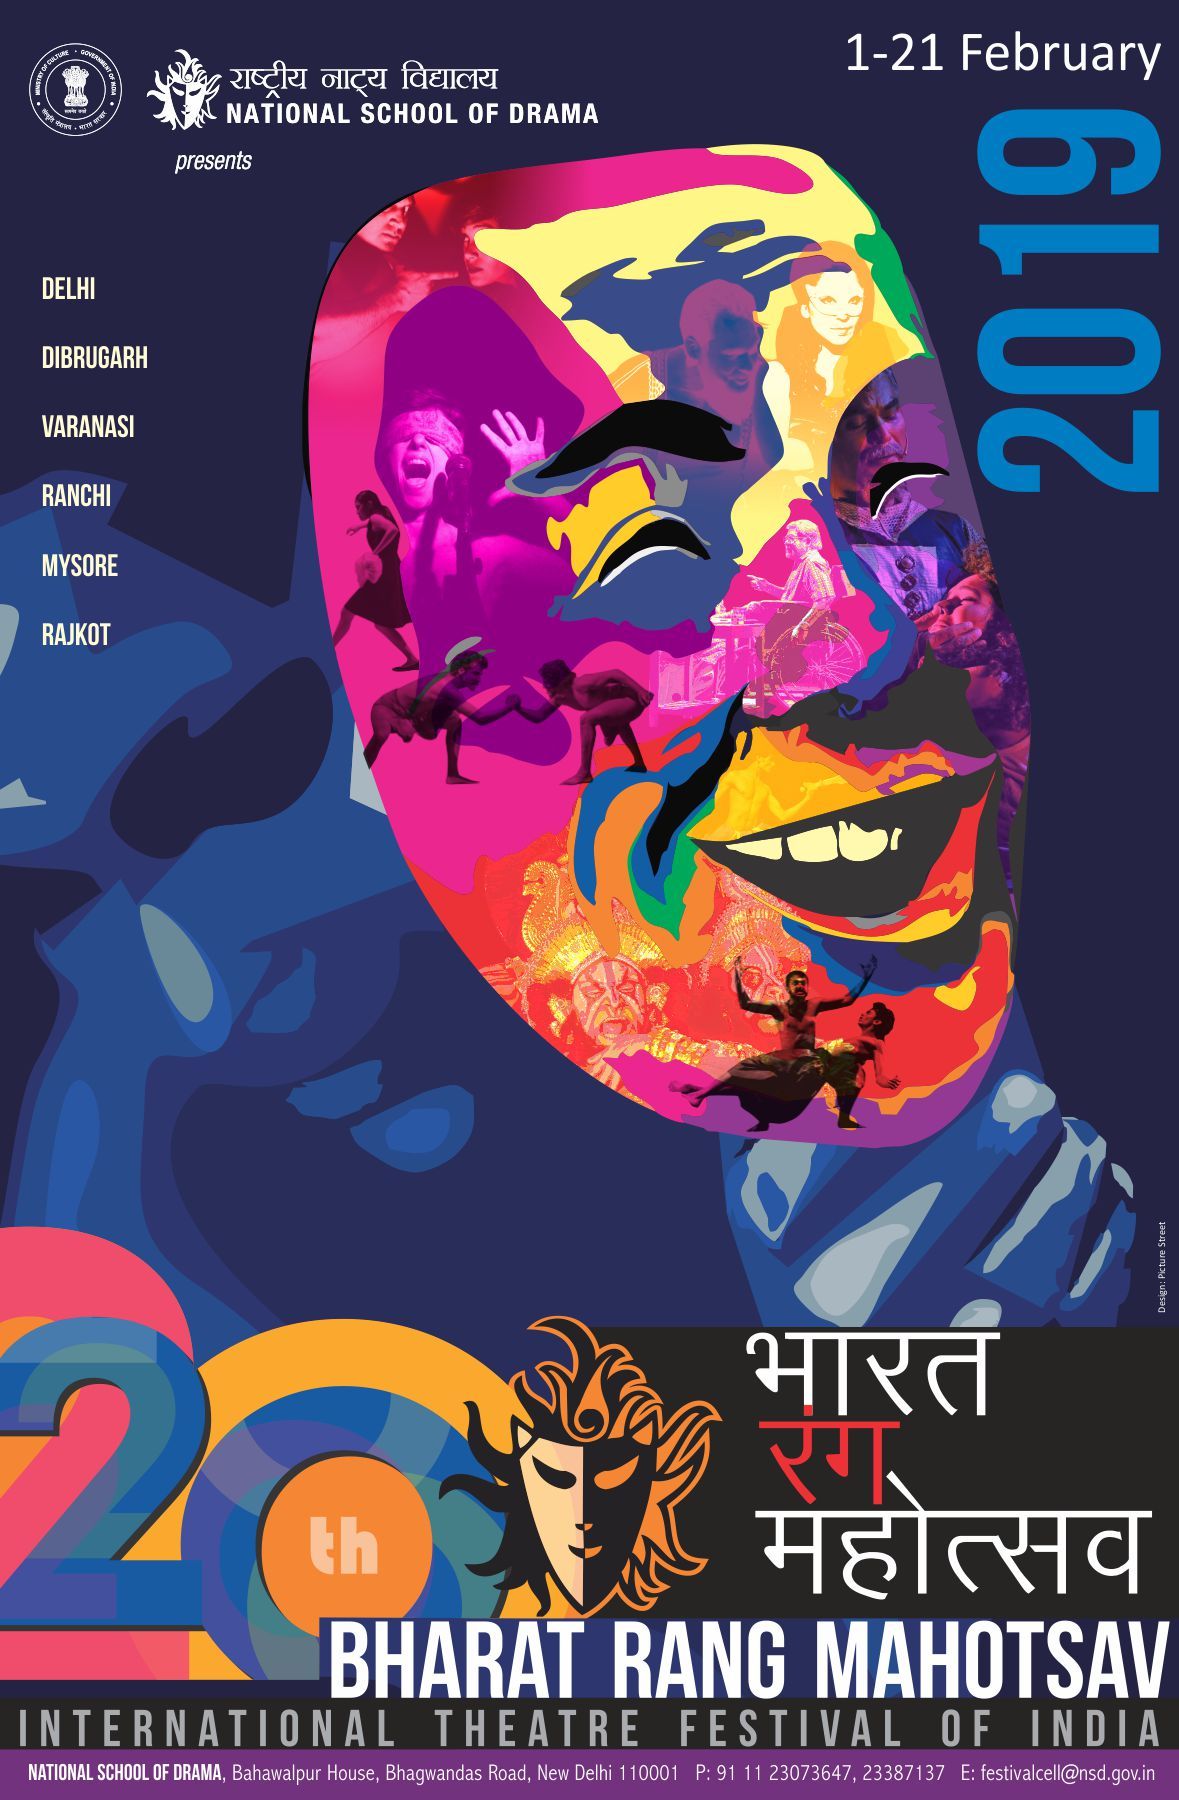 20th Bharat Rang Mahotsav 2019